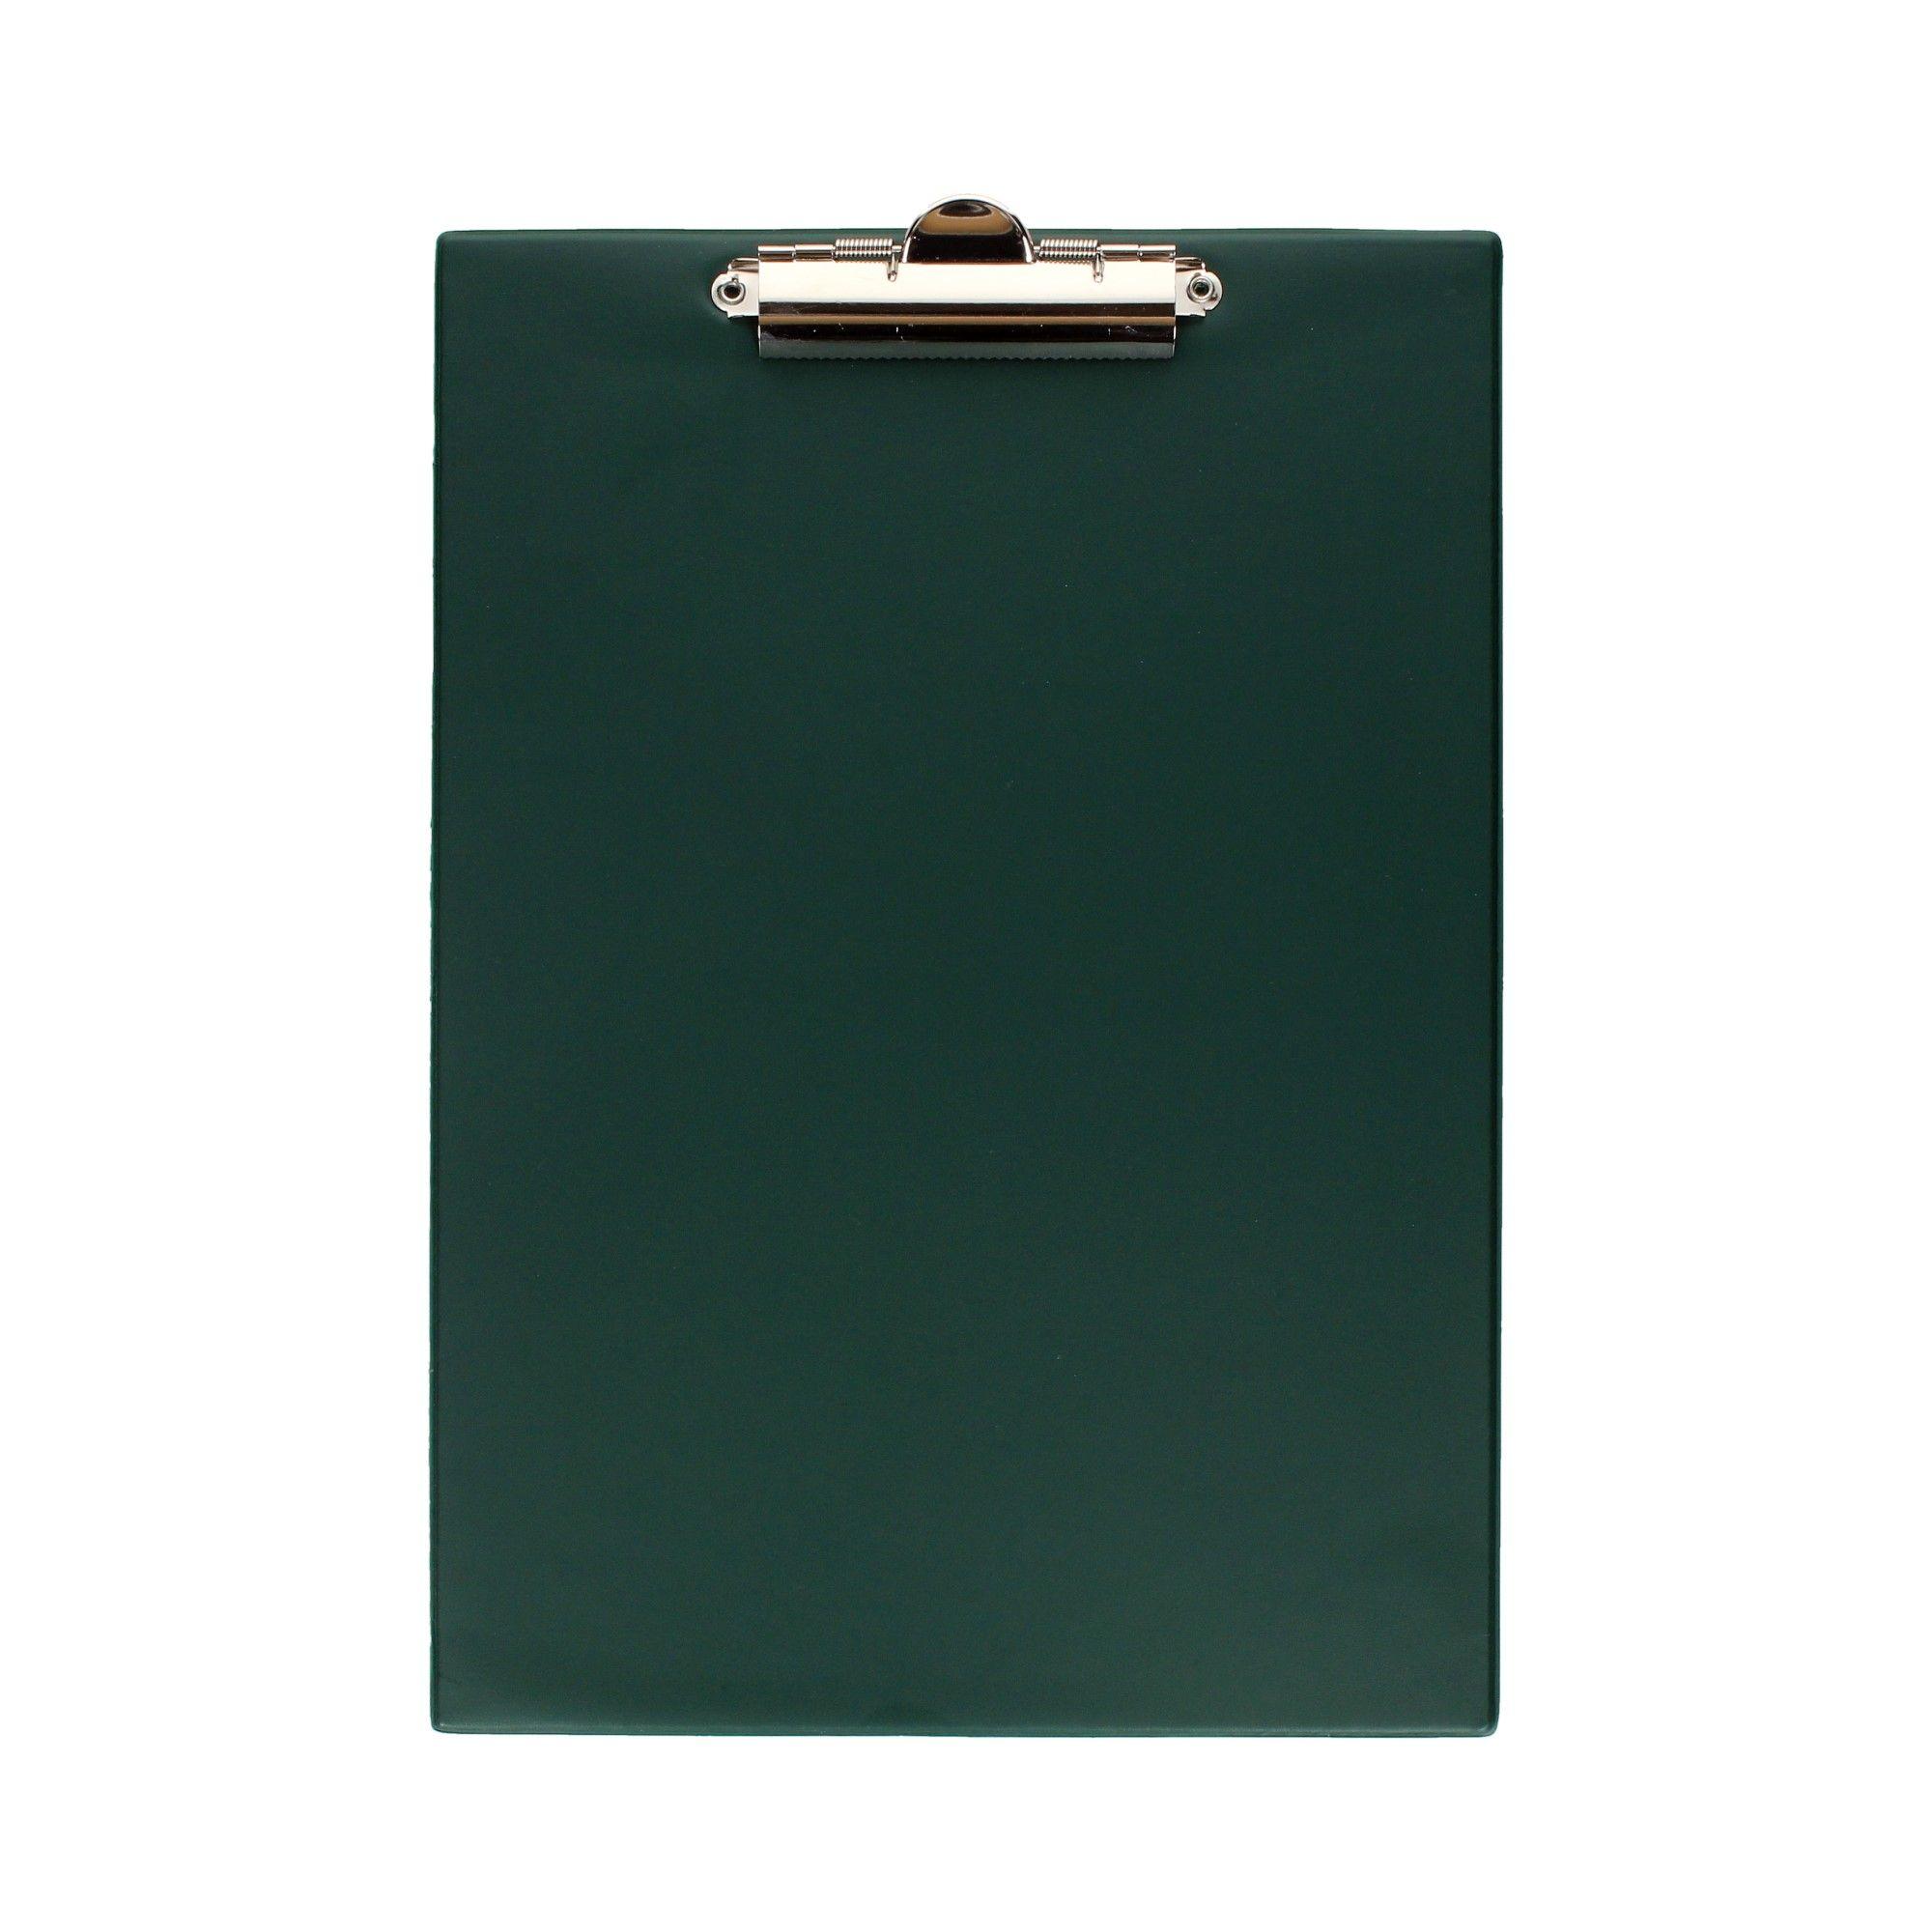 Doska s klip A4 podložka tmavo zelená podložka